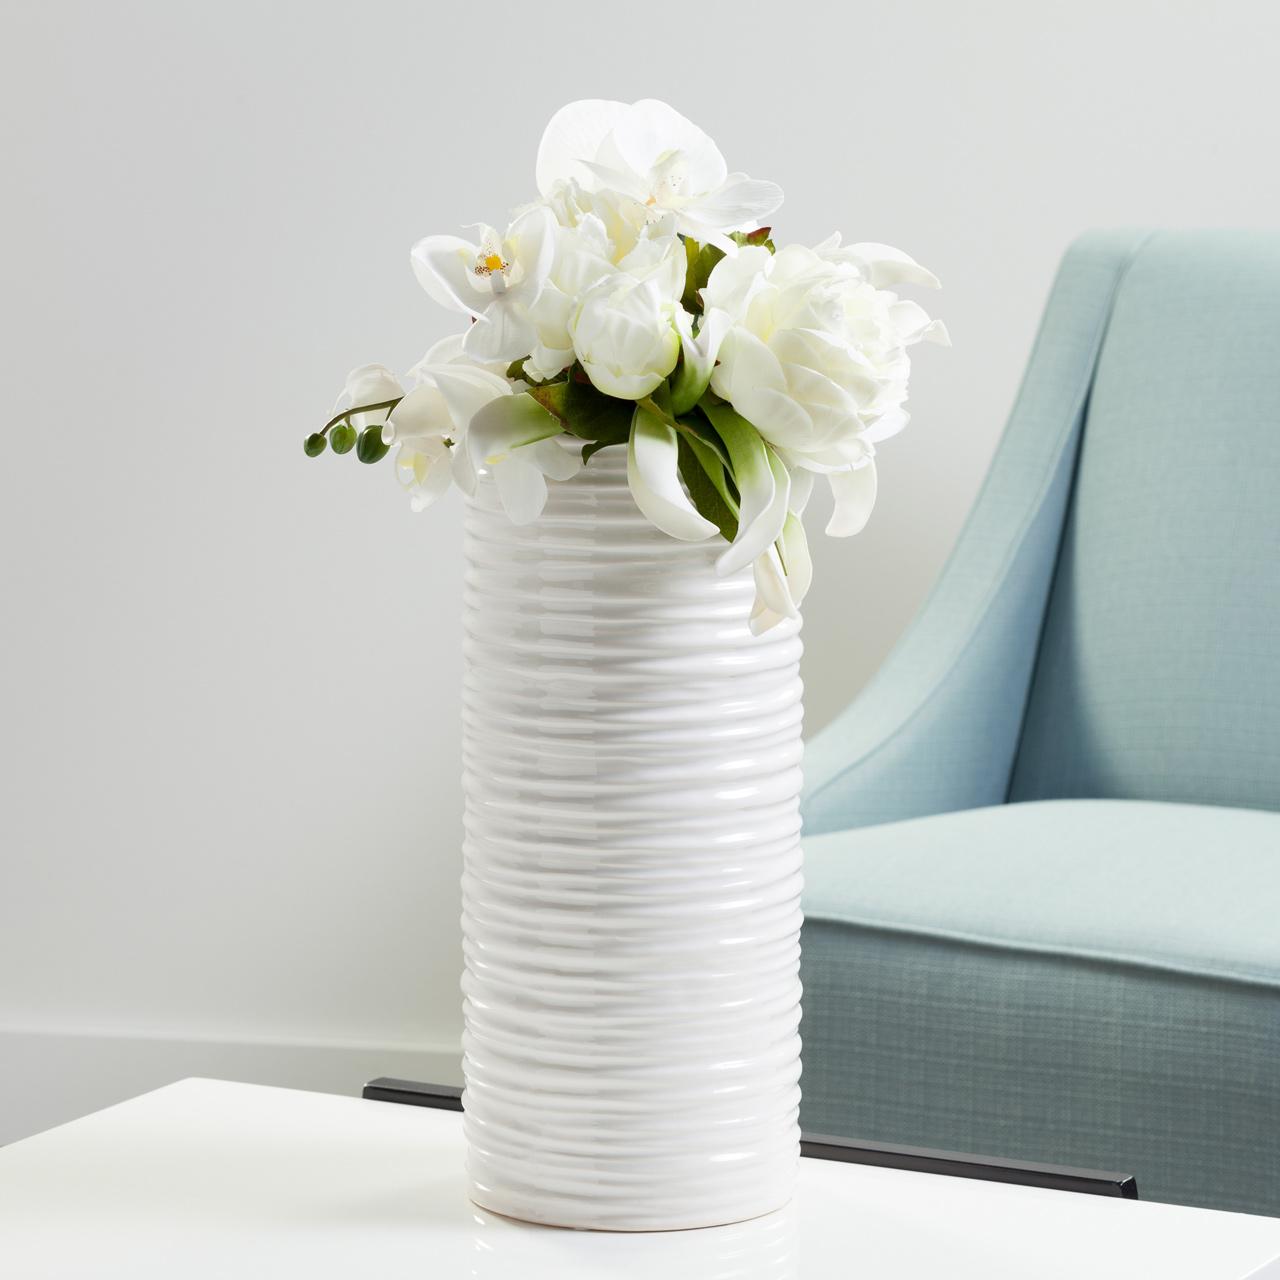 Ripple Cylinder Vases | alvaluz.com